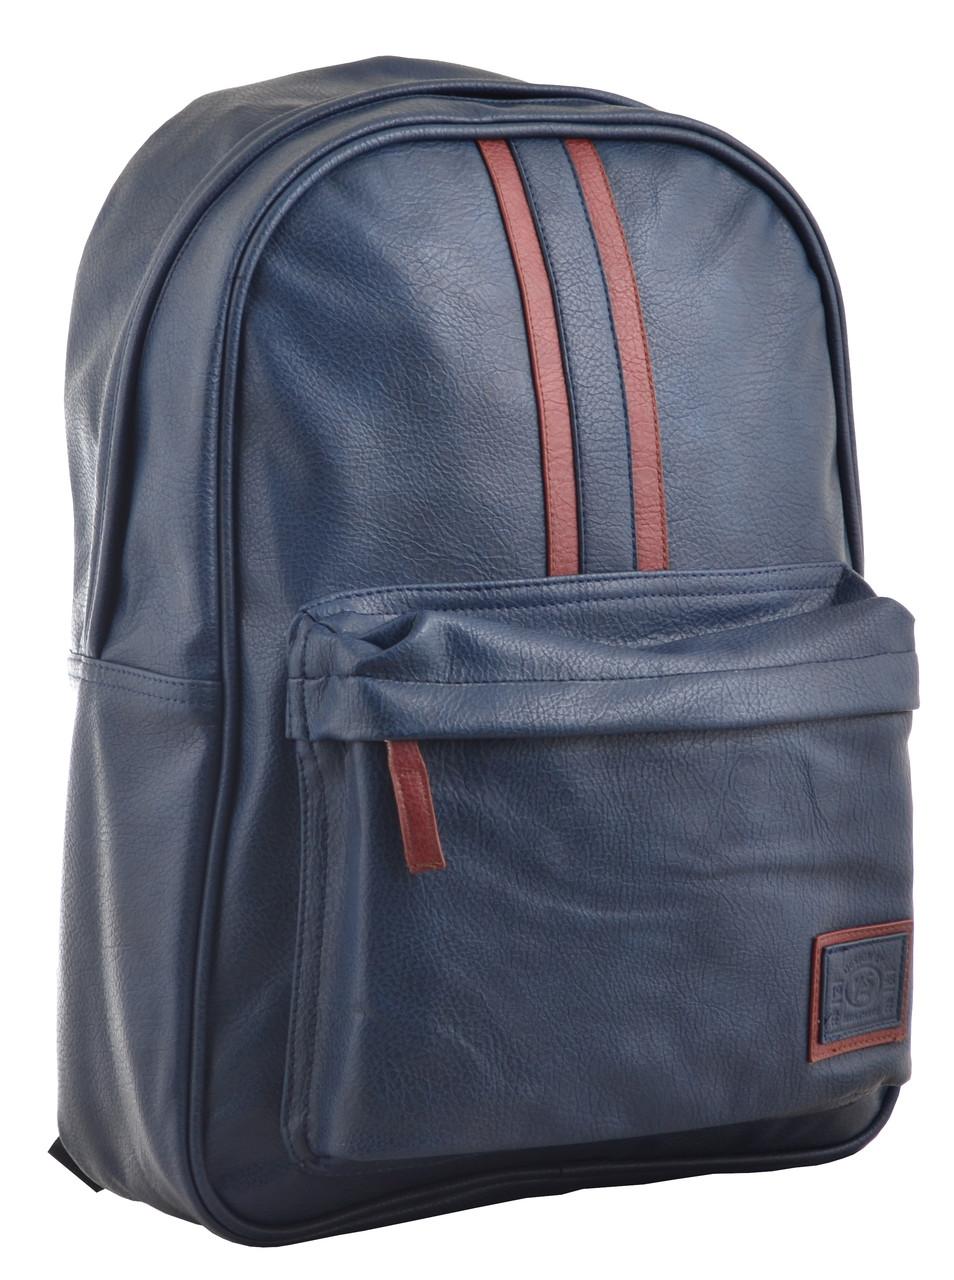 Рюкзак молодежный ST-16 Infinity dark blue, 42*31*13